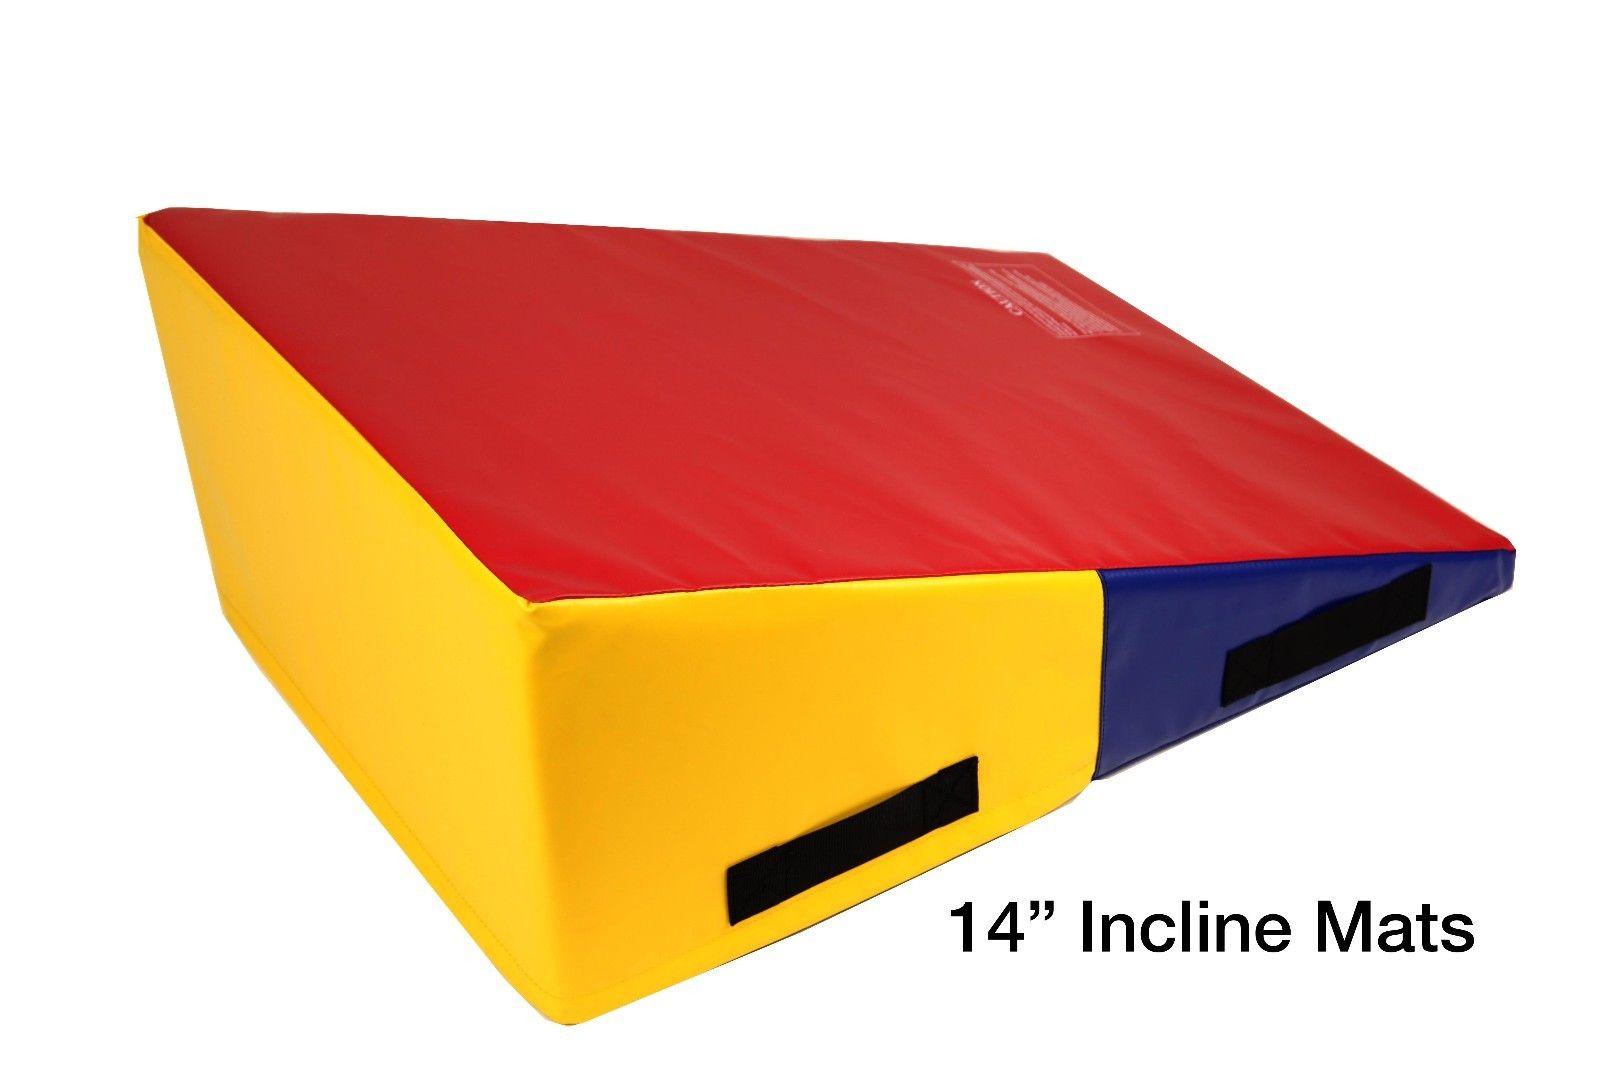 Incstores Incline Mats Portable Practice Tumbling